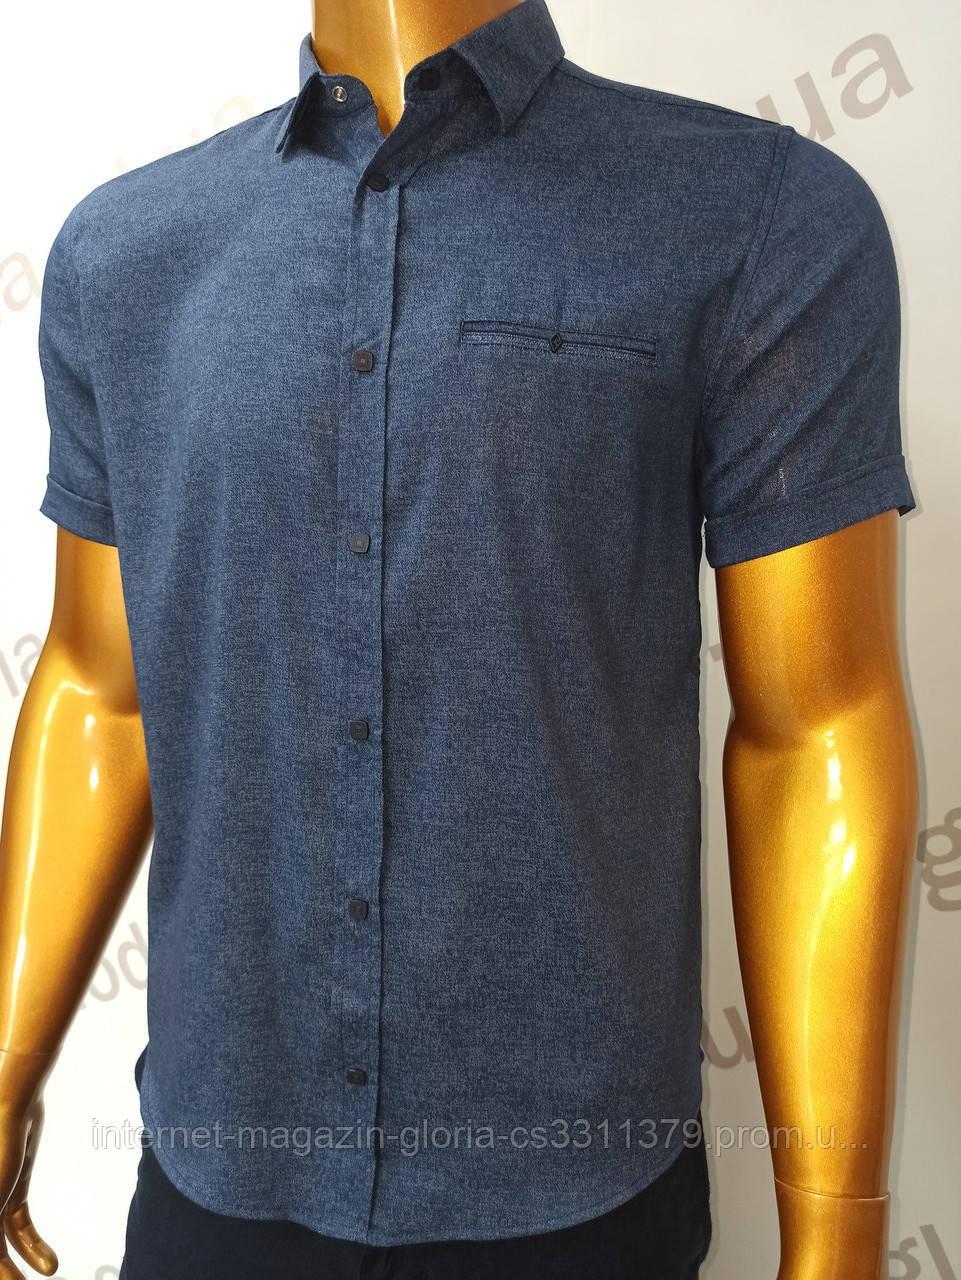 Мужская рубашка Amato. AG.19397-2(s). Размеры:M,L,XL(2), 2XL.